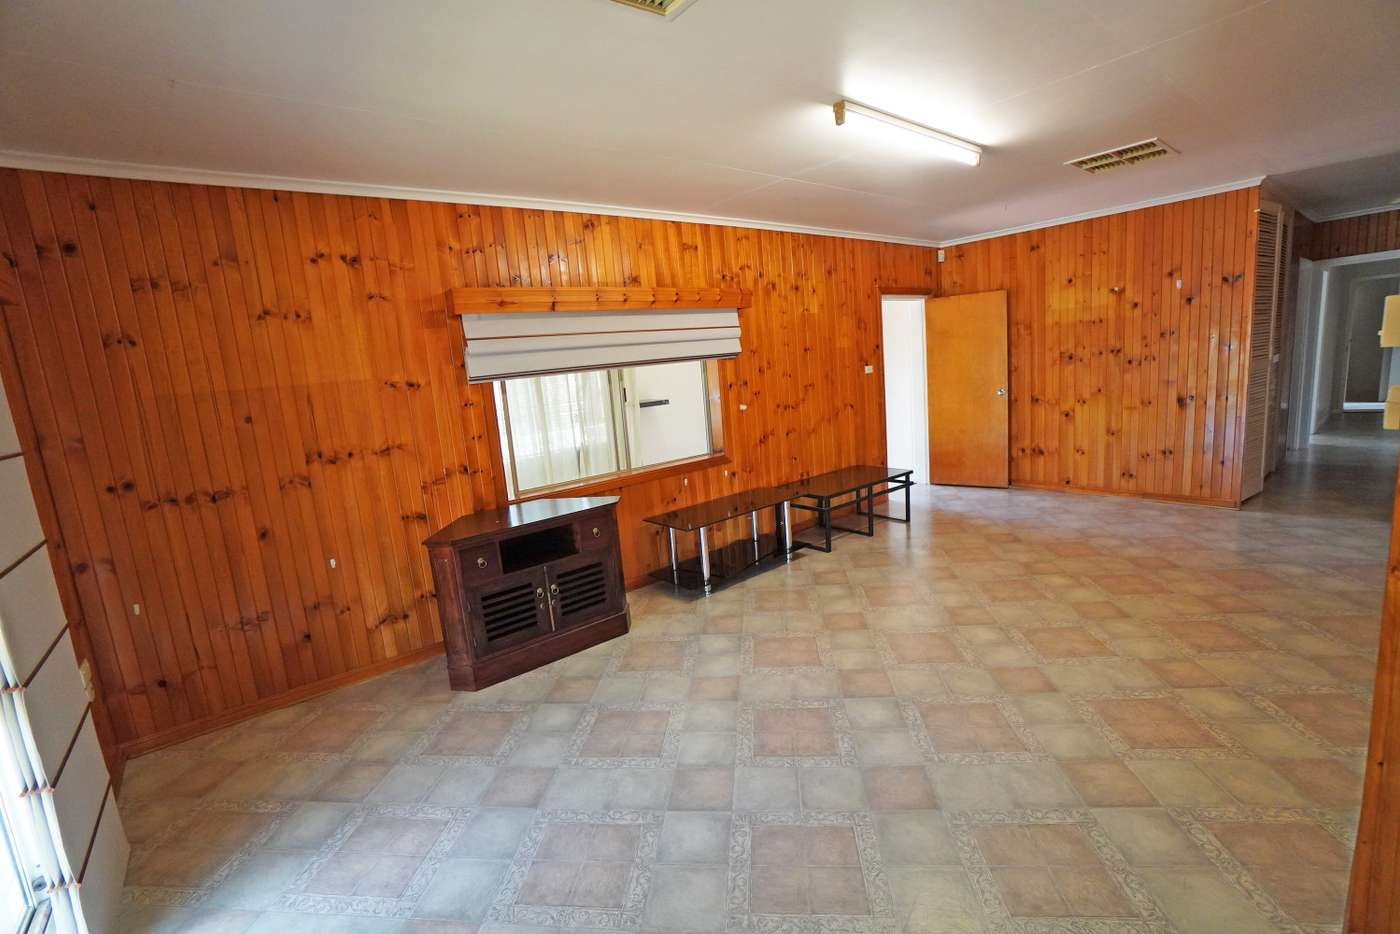 Sixth view of Homely house listing, 3 Carrol Street, Mareeba QLD 4880